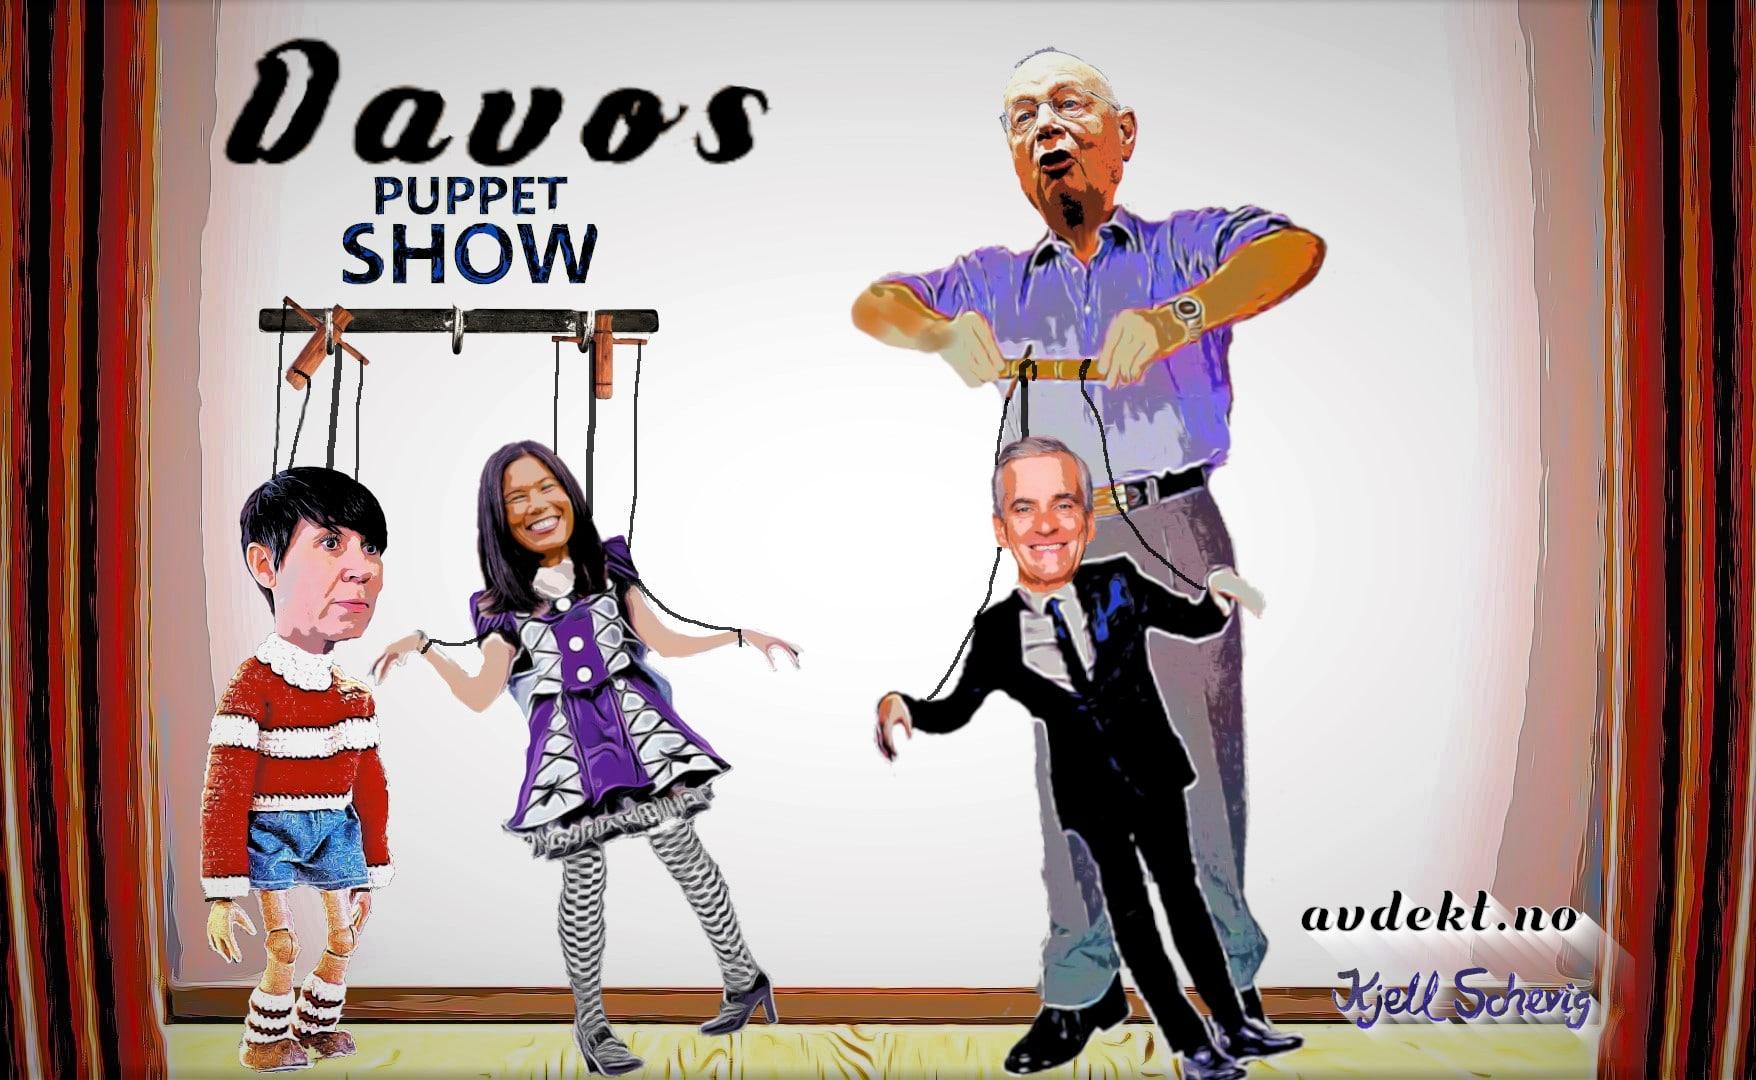 Norske politikere opptrer på Davos Puppet Show